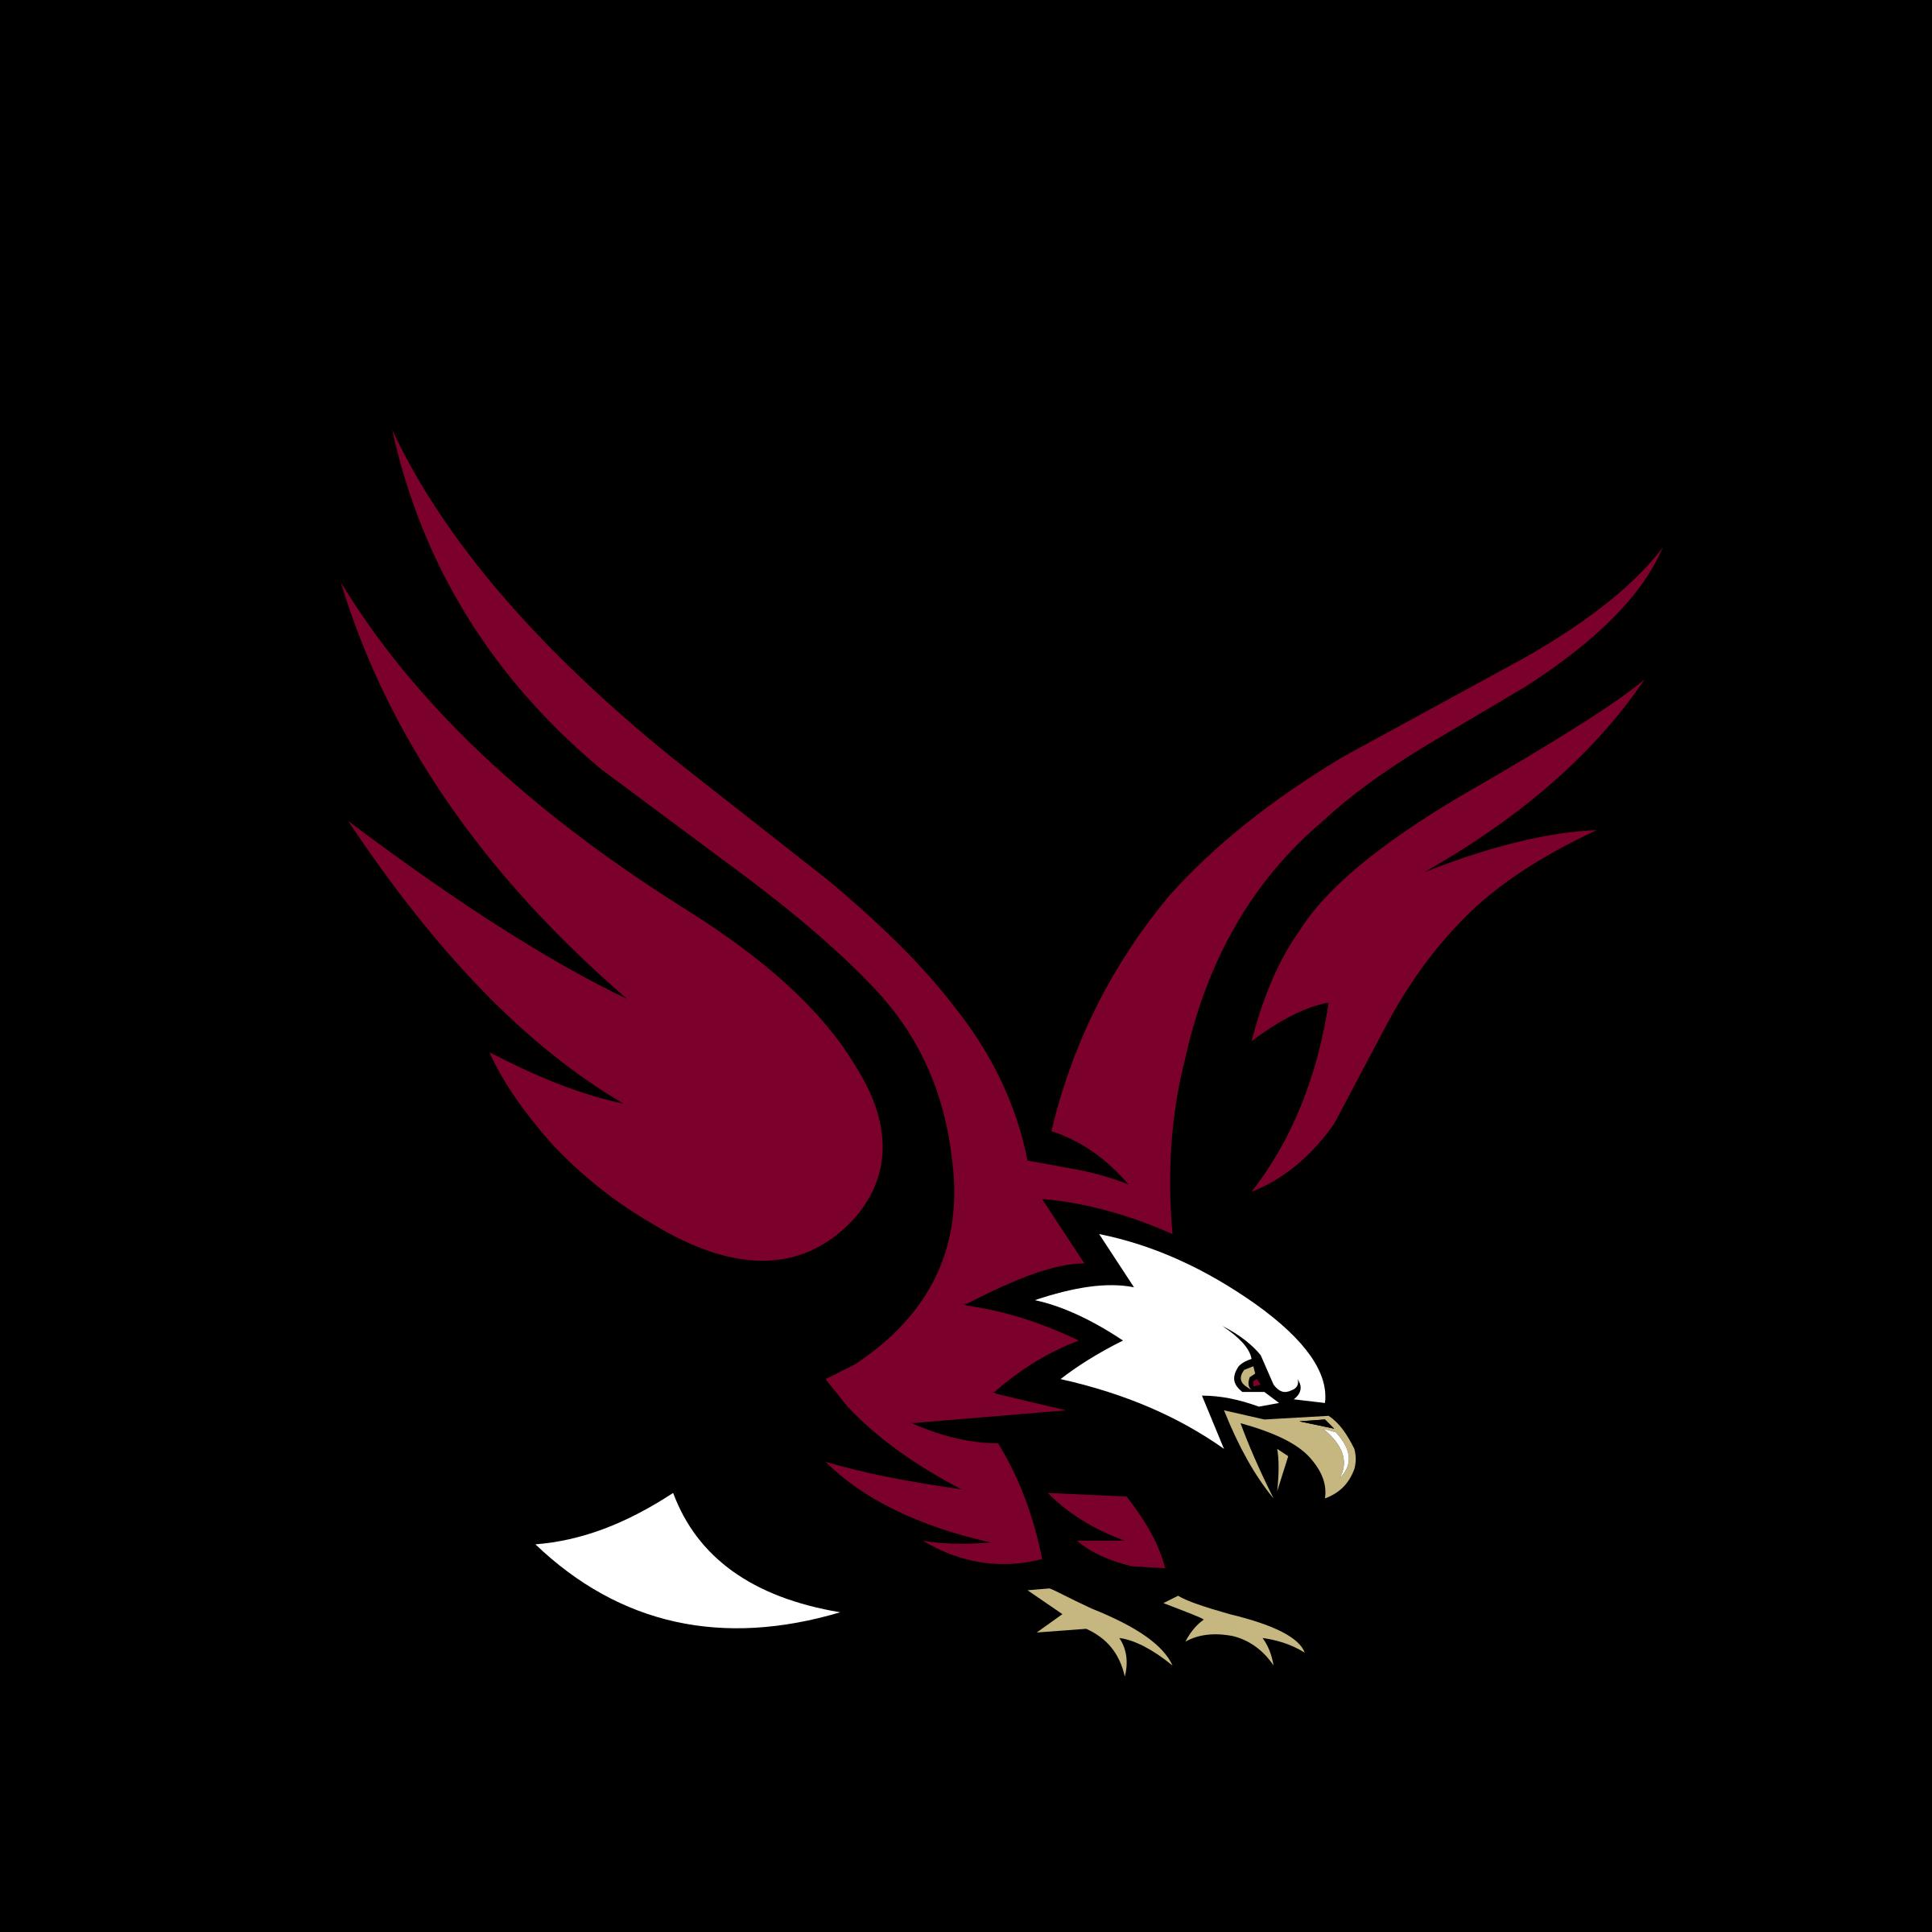 Boston College Eagles 02 Logo PNG Transparent & SVG Vector ...